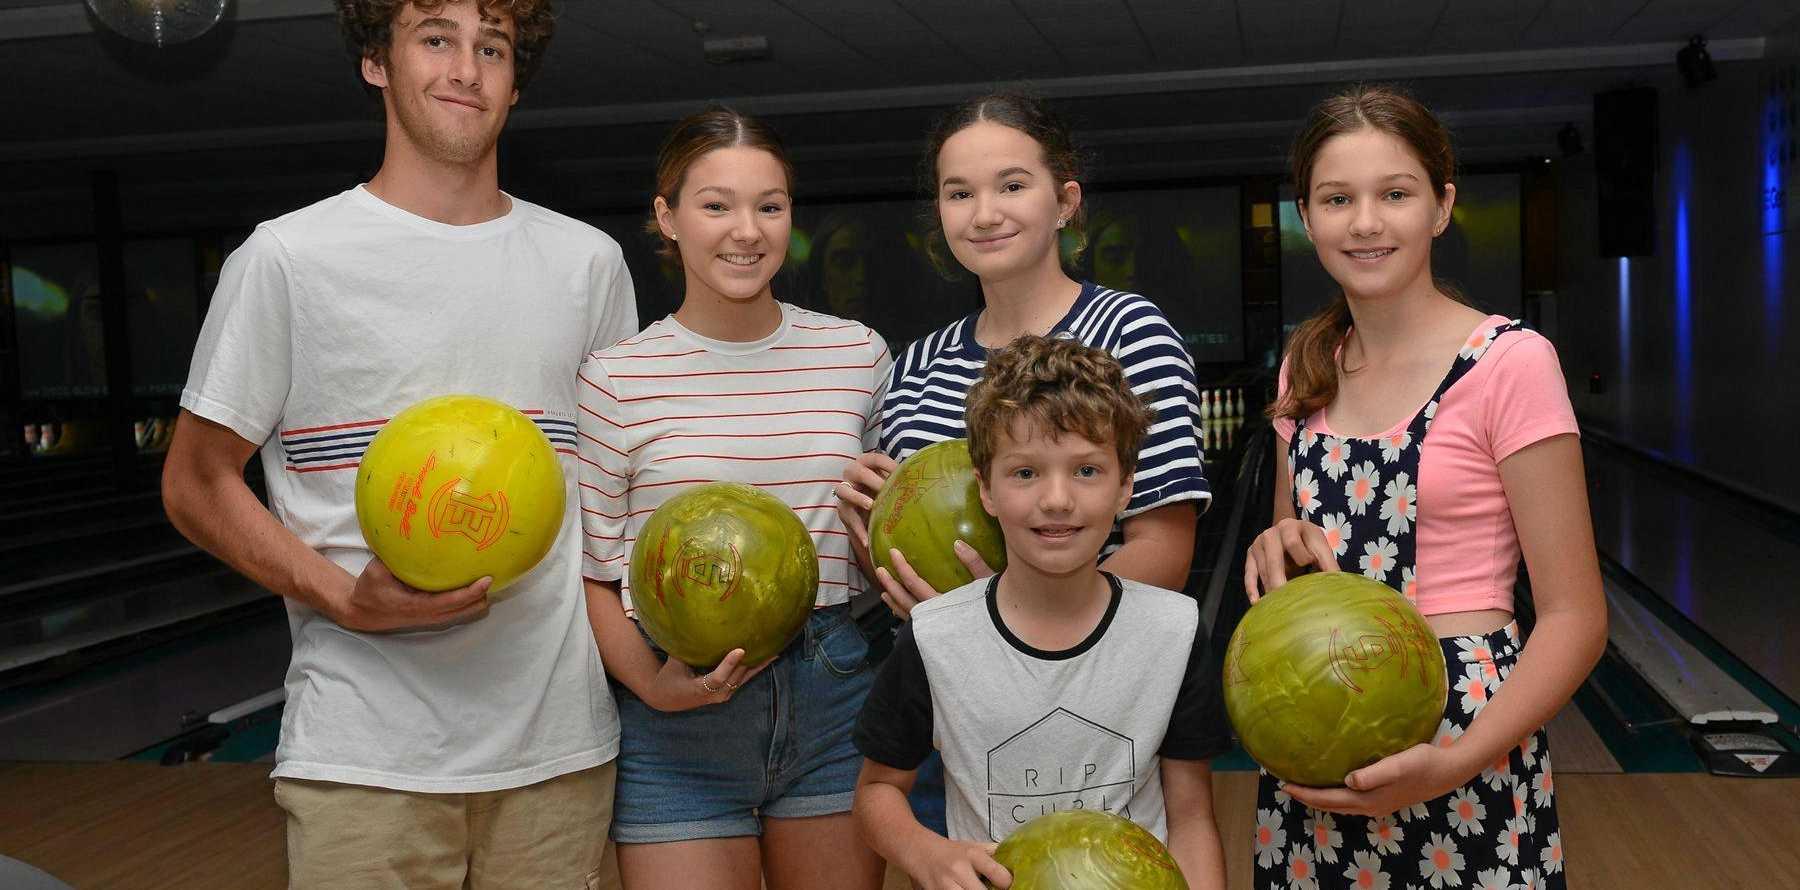 HOLIDAY FUN: Luca Felesina, Isabella, Sofie, Gabrielle and William Bonanno at Bundy Bowl and Leisure.